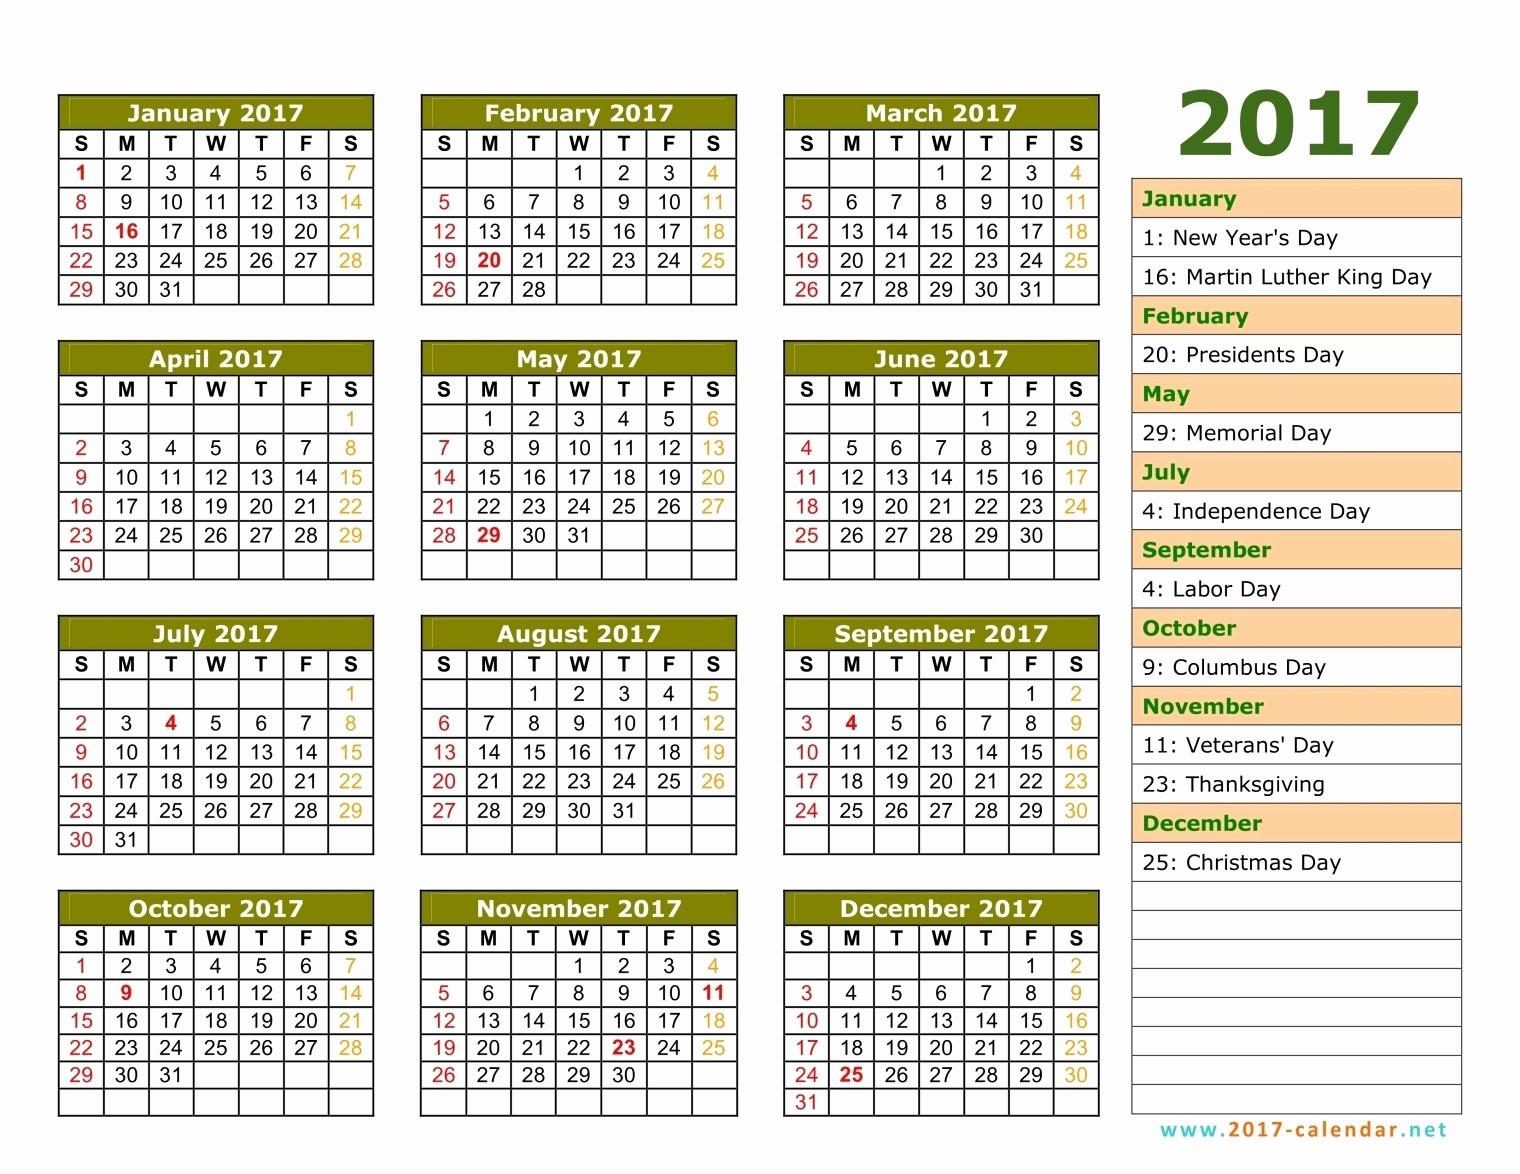 Calendar 2017 Template with Holidays Elegant November 2017 Calendar with Holidays